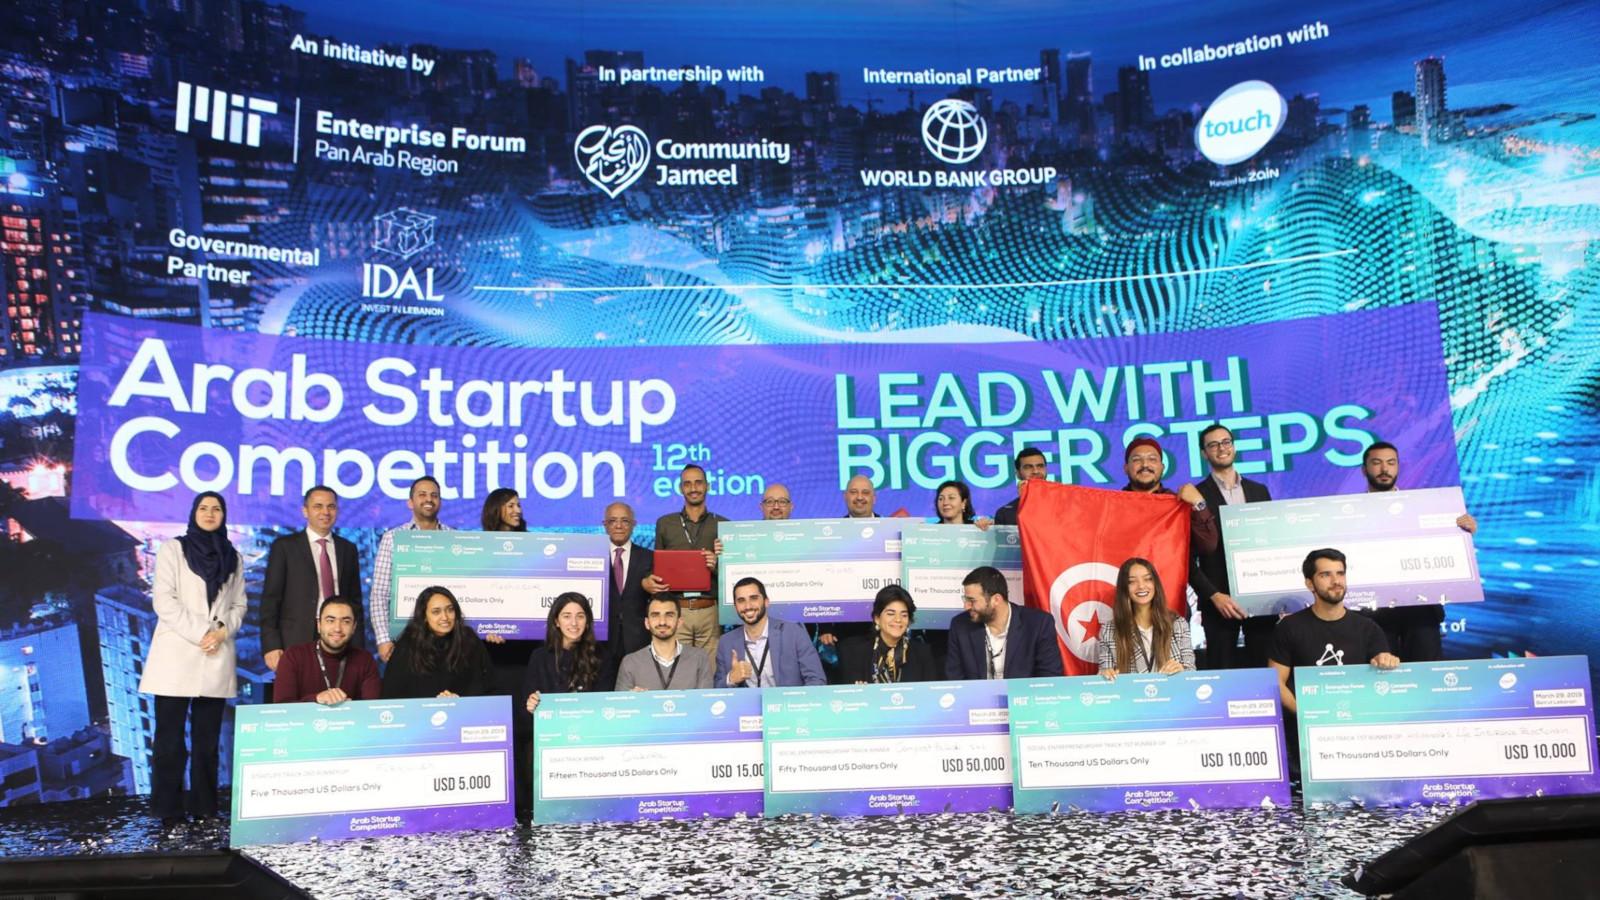 14 African <b>startups</b> make it to 13th MIT Enterprise Forum Arab <b>Startup</b> Competition semi-finals